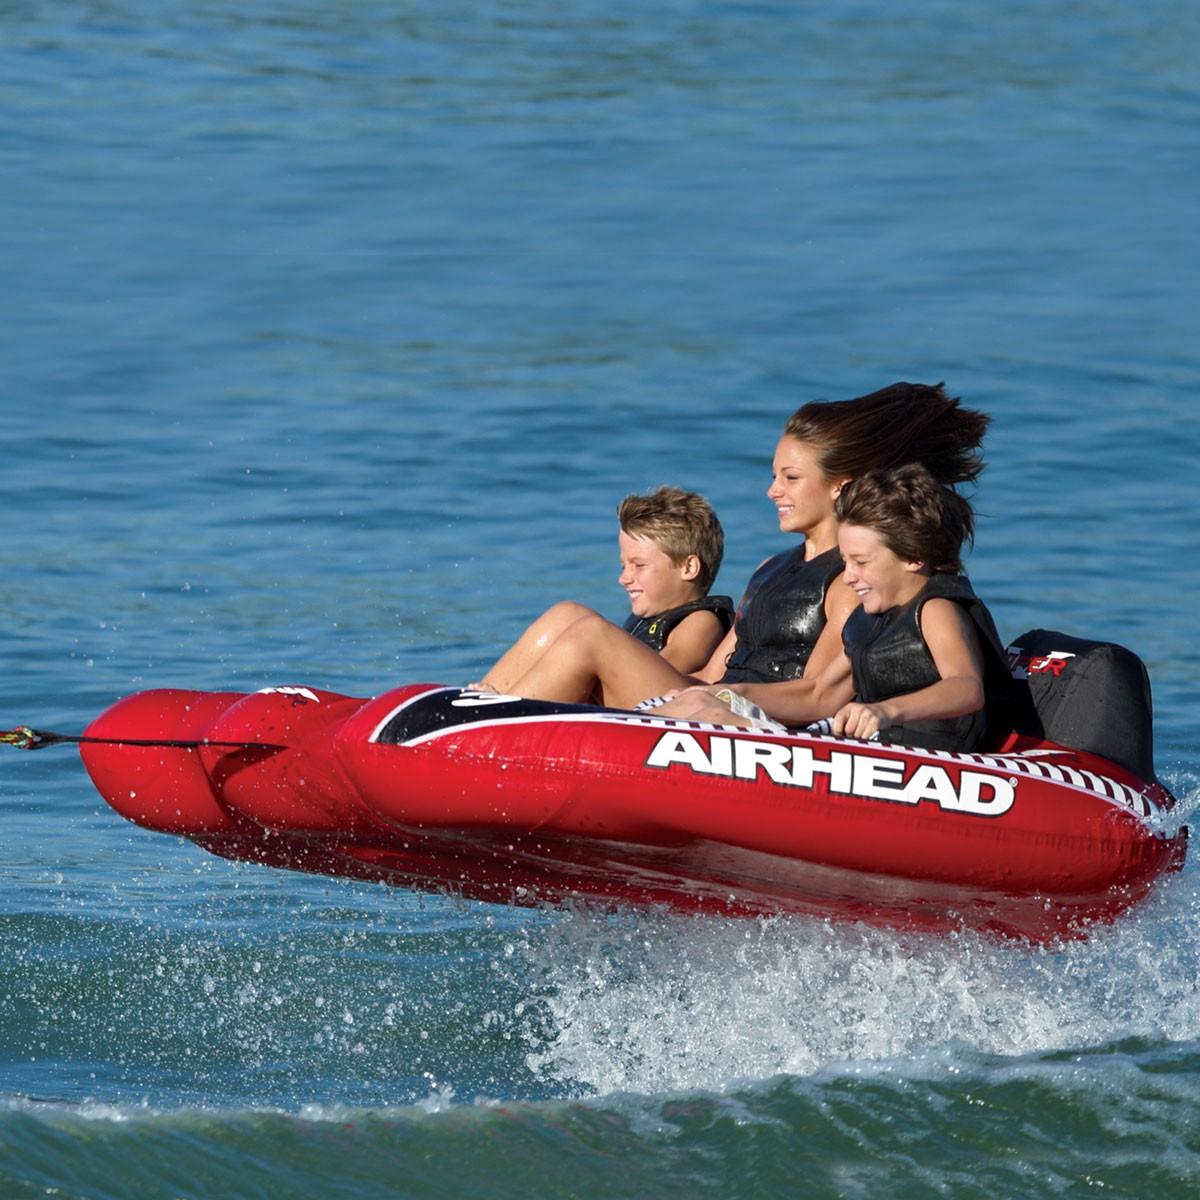 AIRHEAD トーイングチューブ Viper 3 3人乗り ジェットスキー マリンスポーツ 複数 グループ 海 おもちゃ ボート フロート グッズ